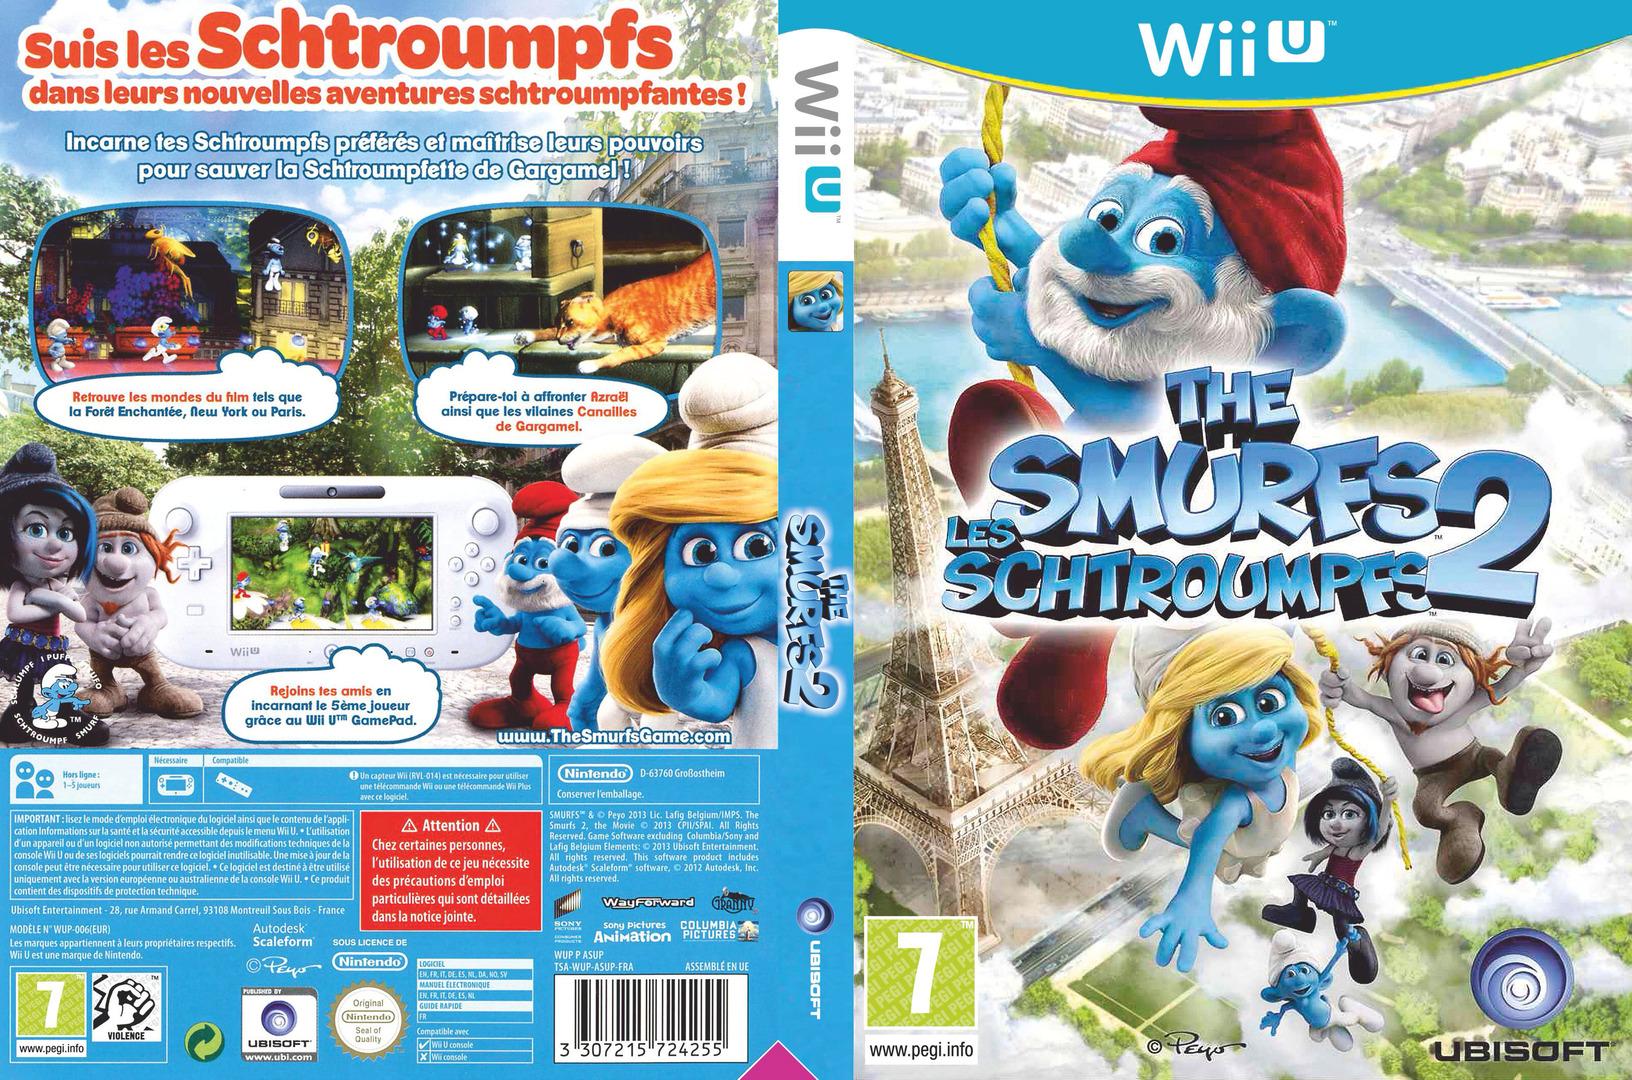 Les schtroumpfs 2 WiiU coverfullHQ (ASUP41)